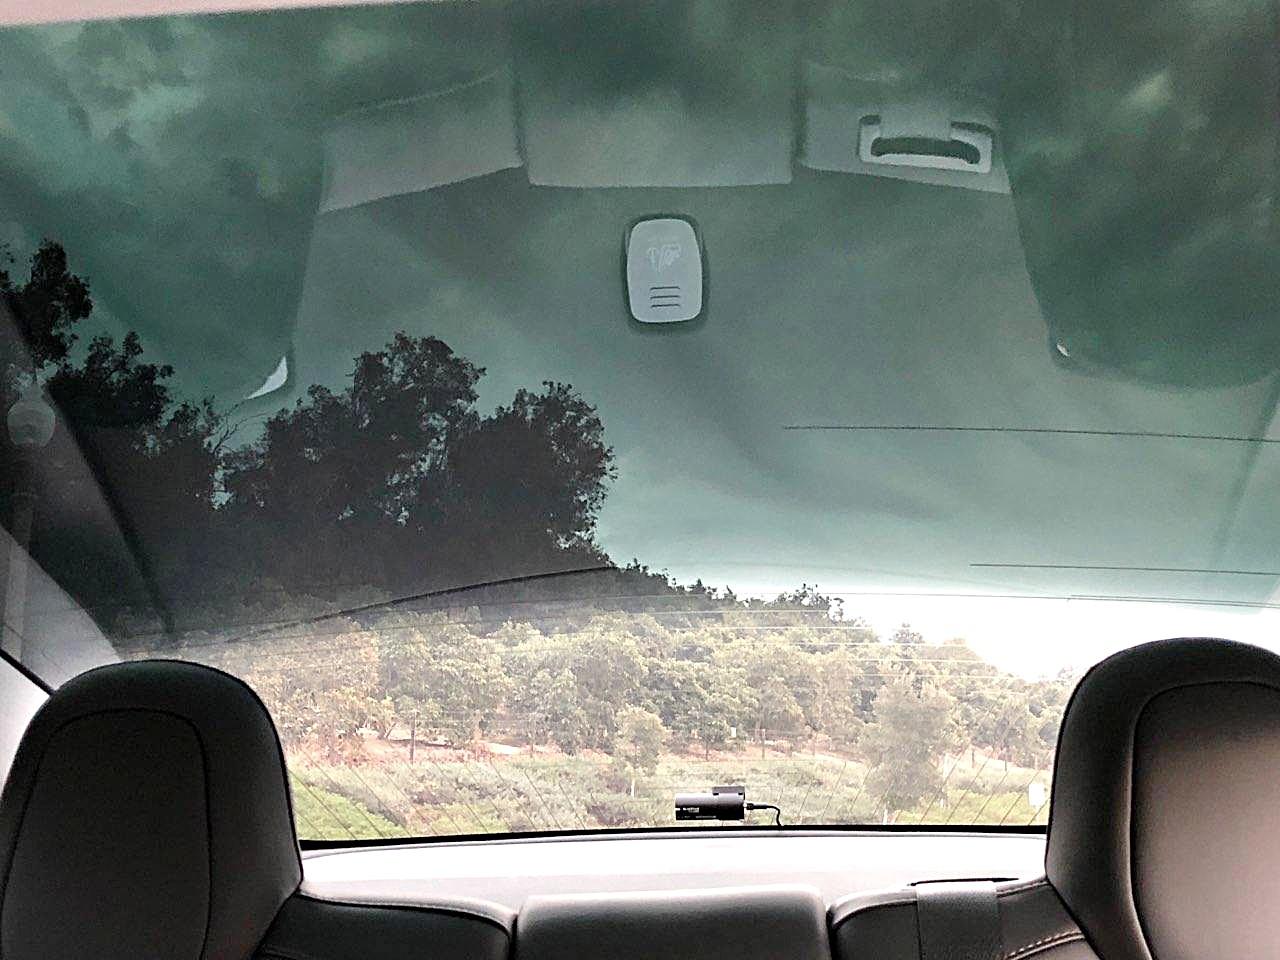 tesla-model-3-rear-dashcam-glass-roof